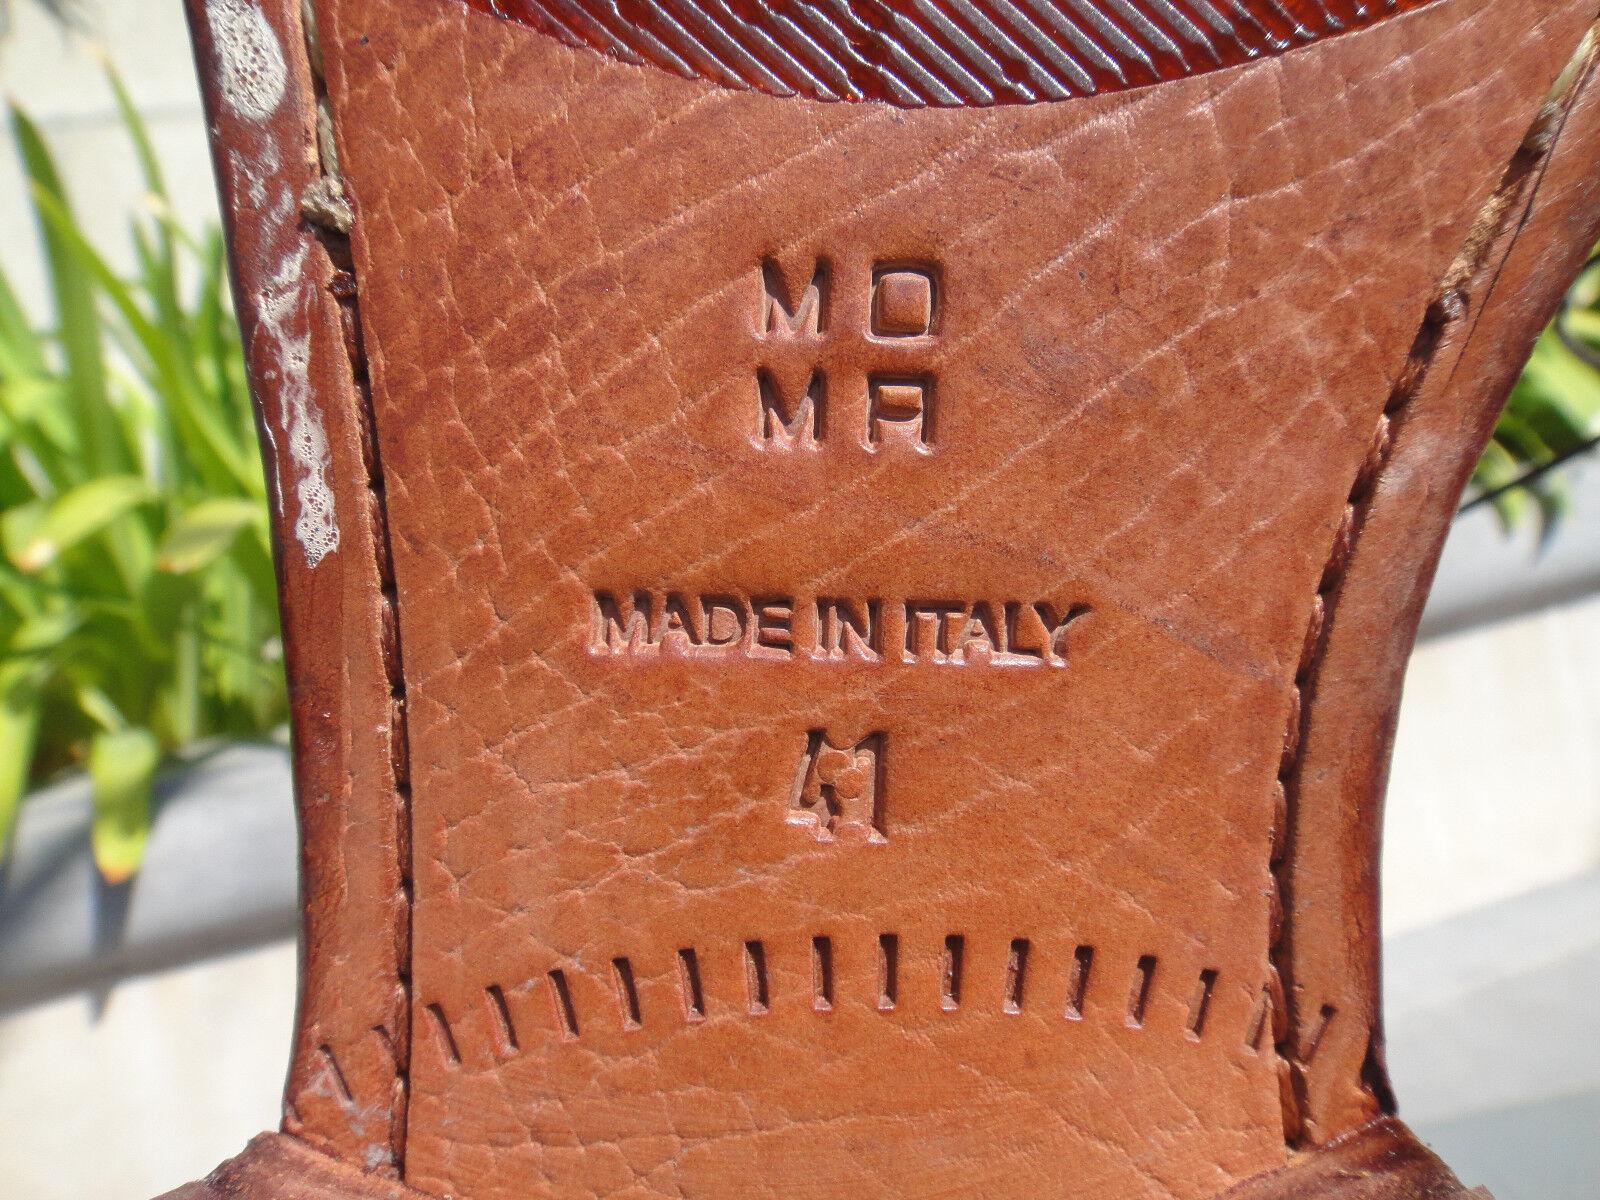 MOMA 16601-8C Splendid Cuoio, Tan Tan Tan Light Brown Pelle Uomo Sz EUR41 MSRP 240 445c27